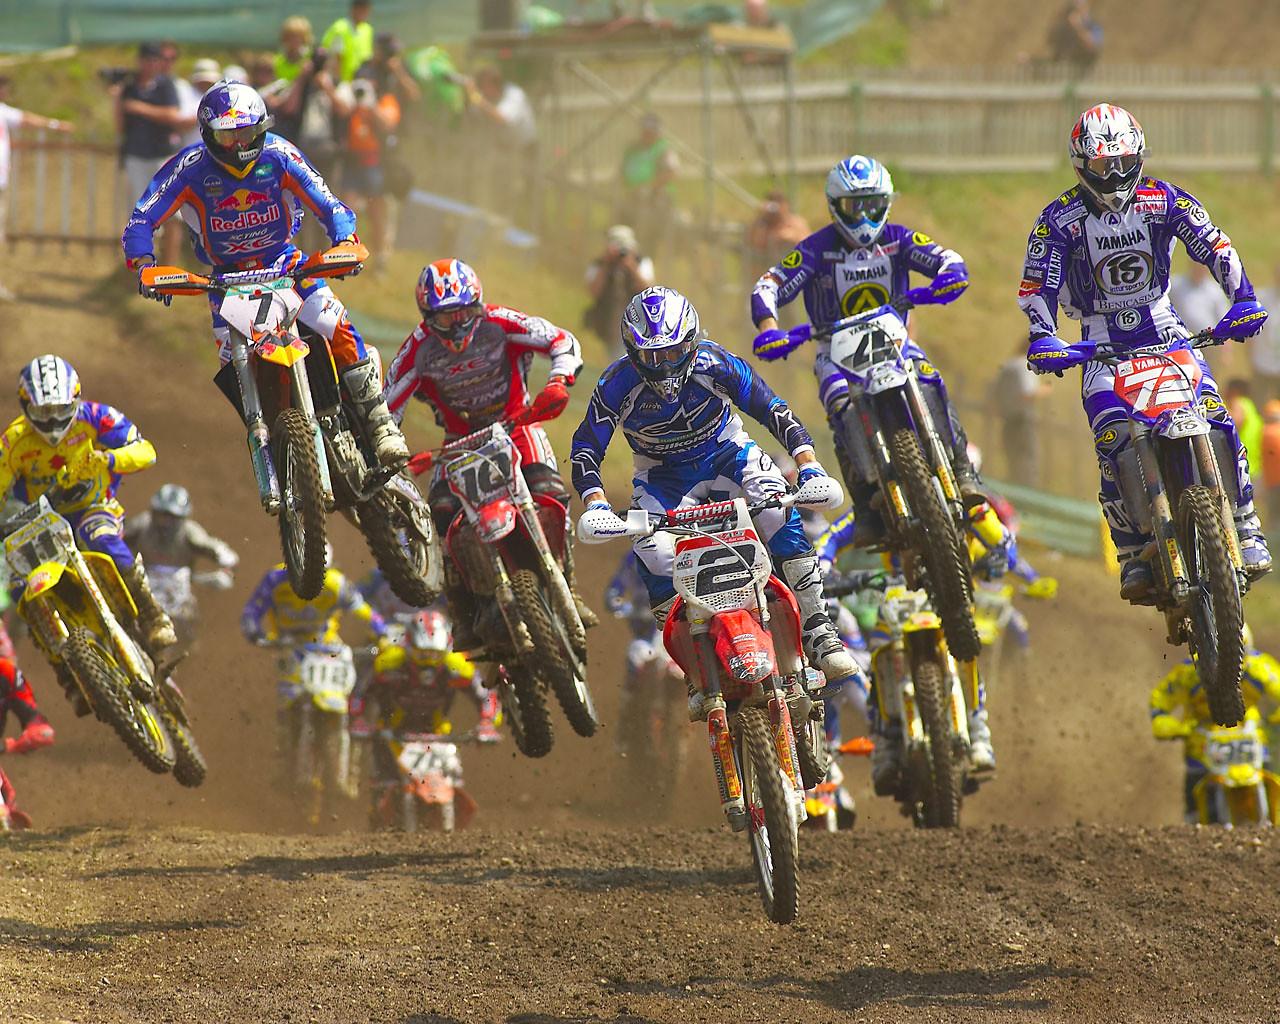 Let the Dogs Go - piambro - Motocross Pictures - Vital MX